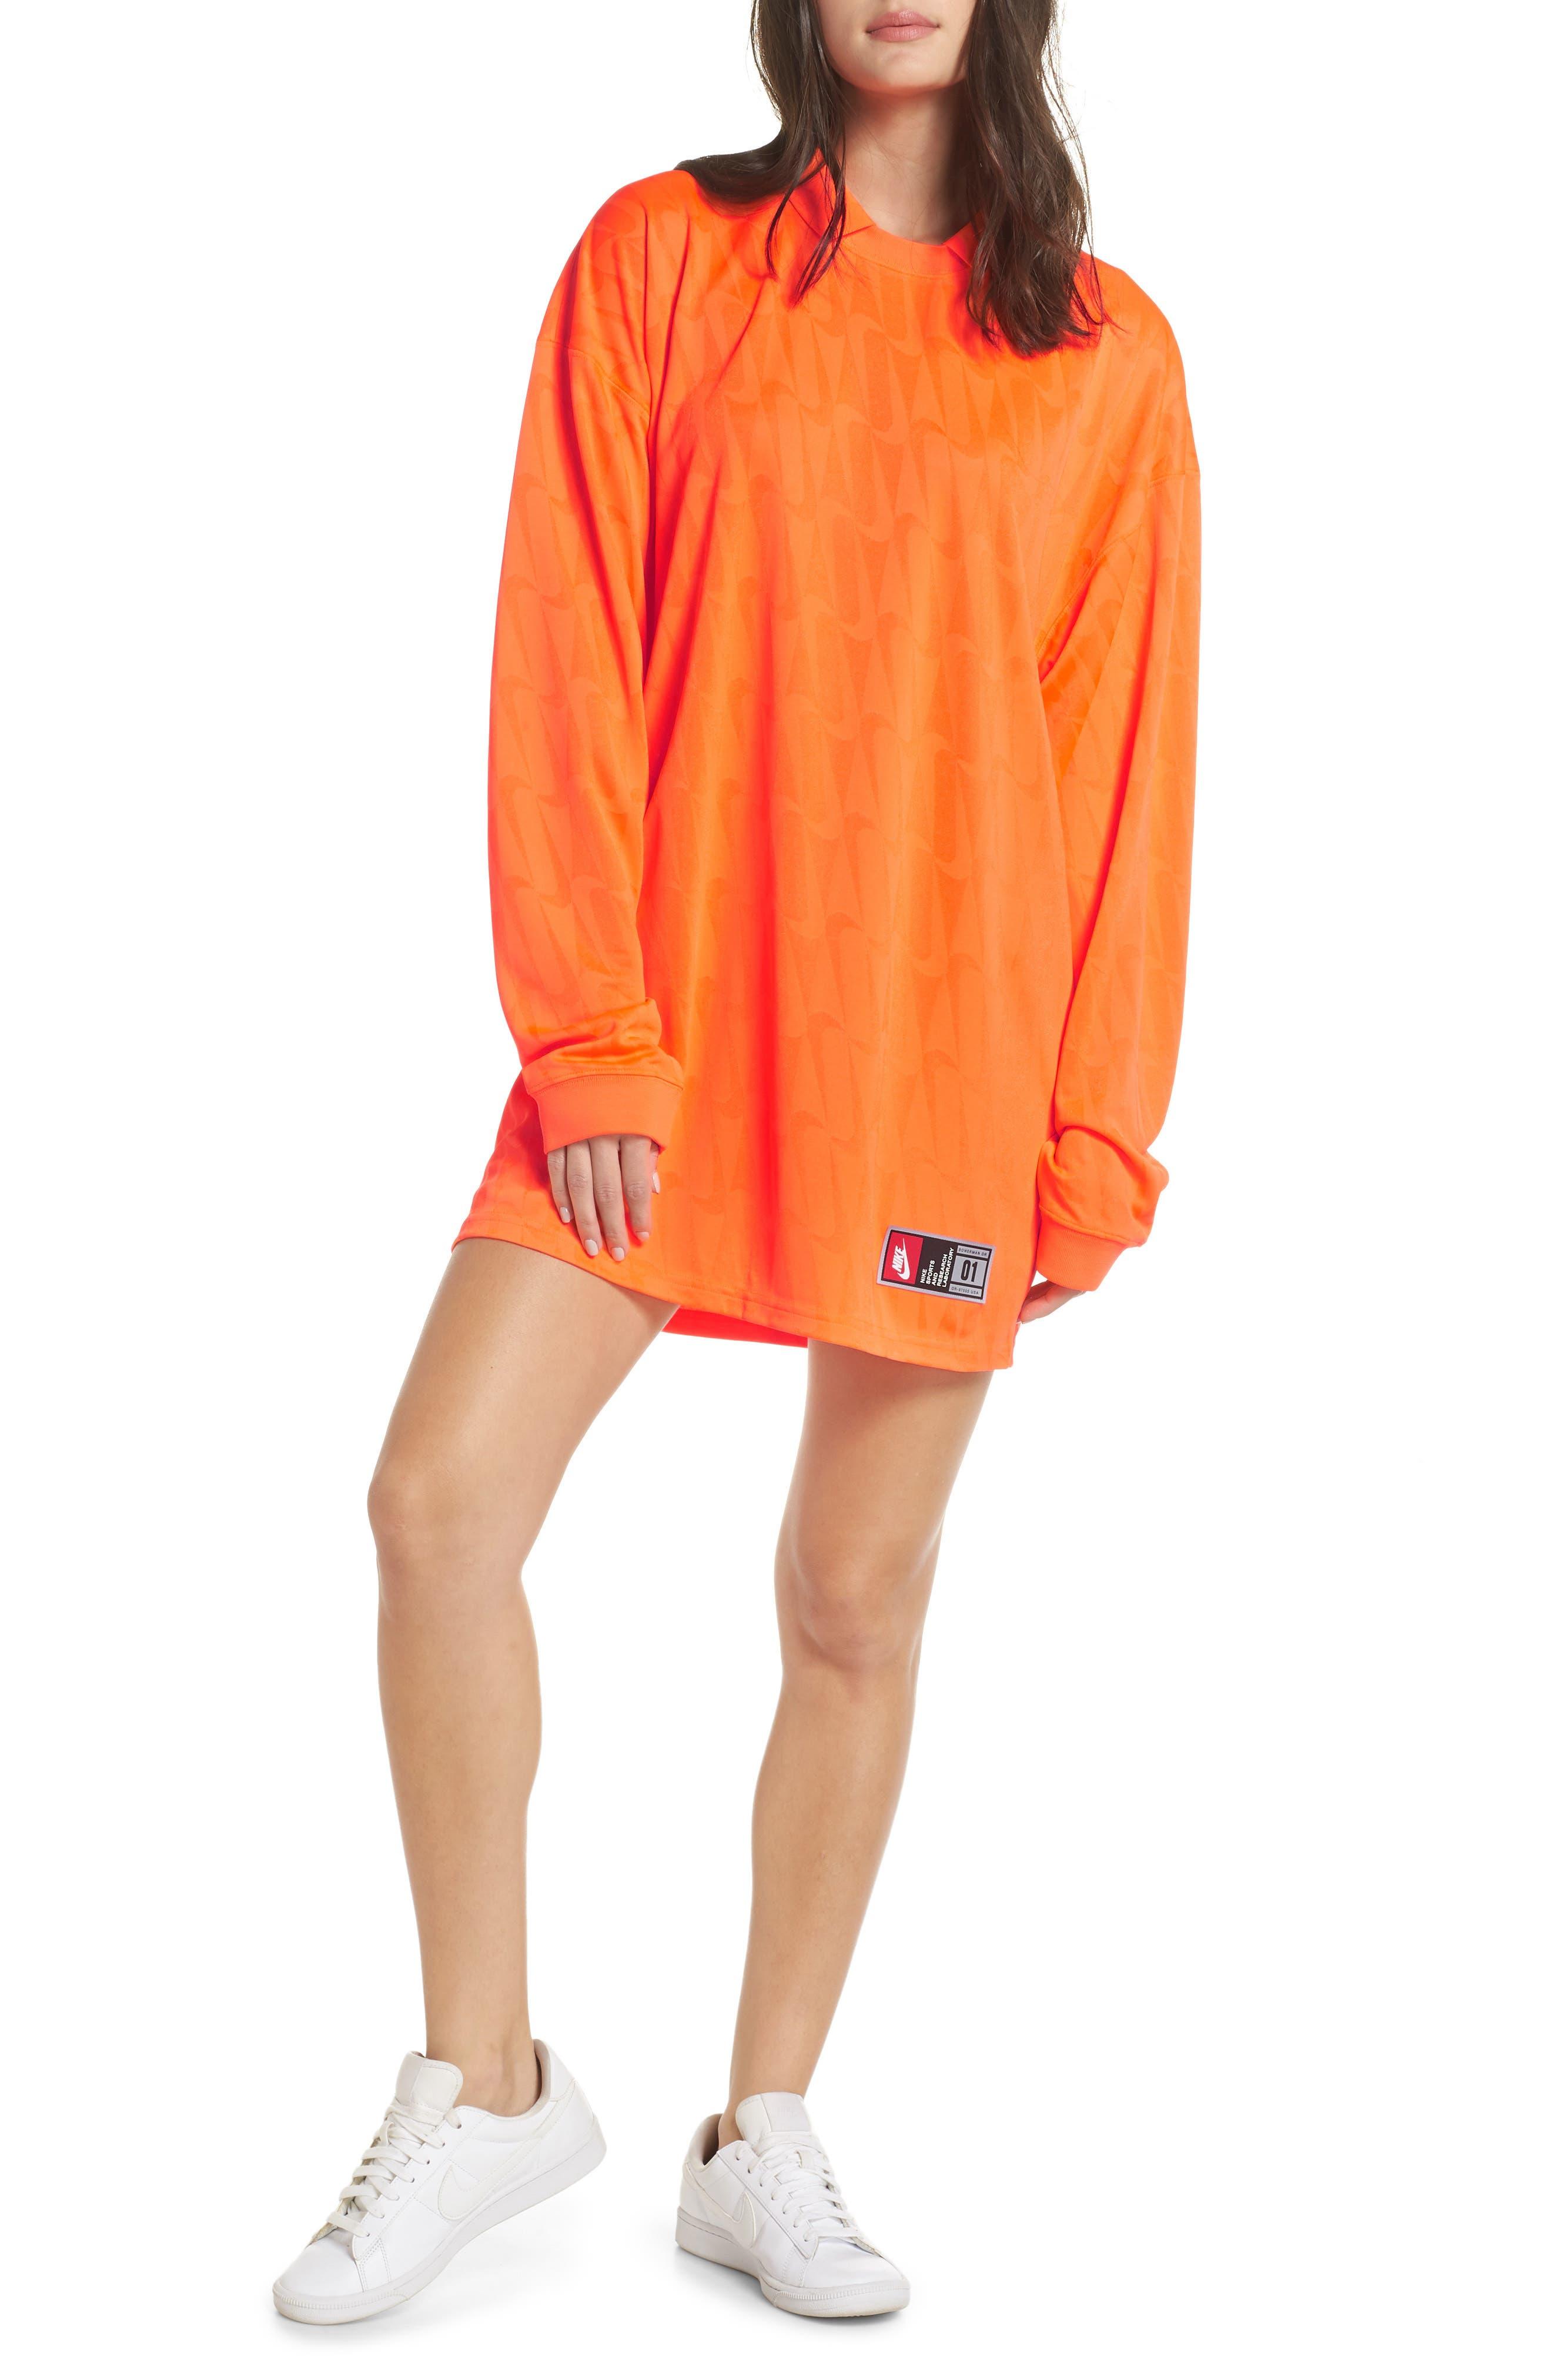 Nike Nrg Jersey Dress, Orange